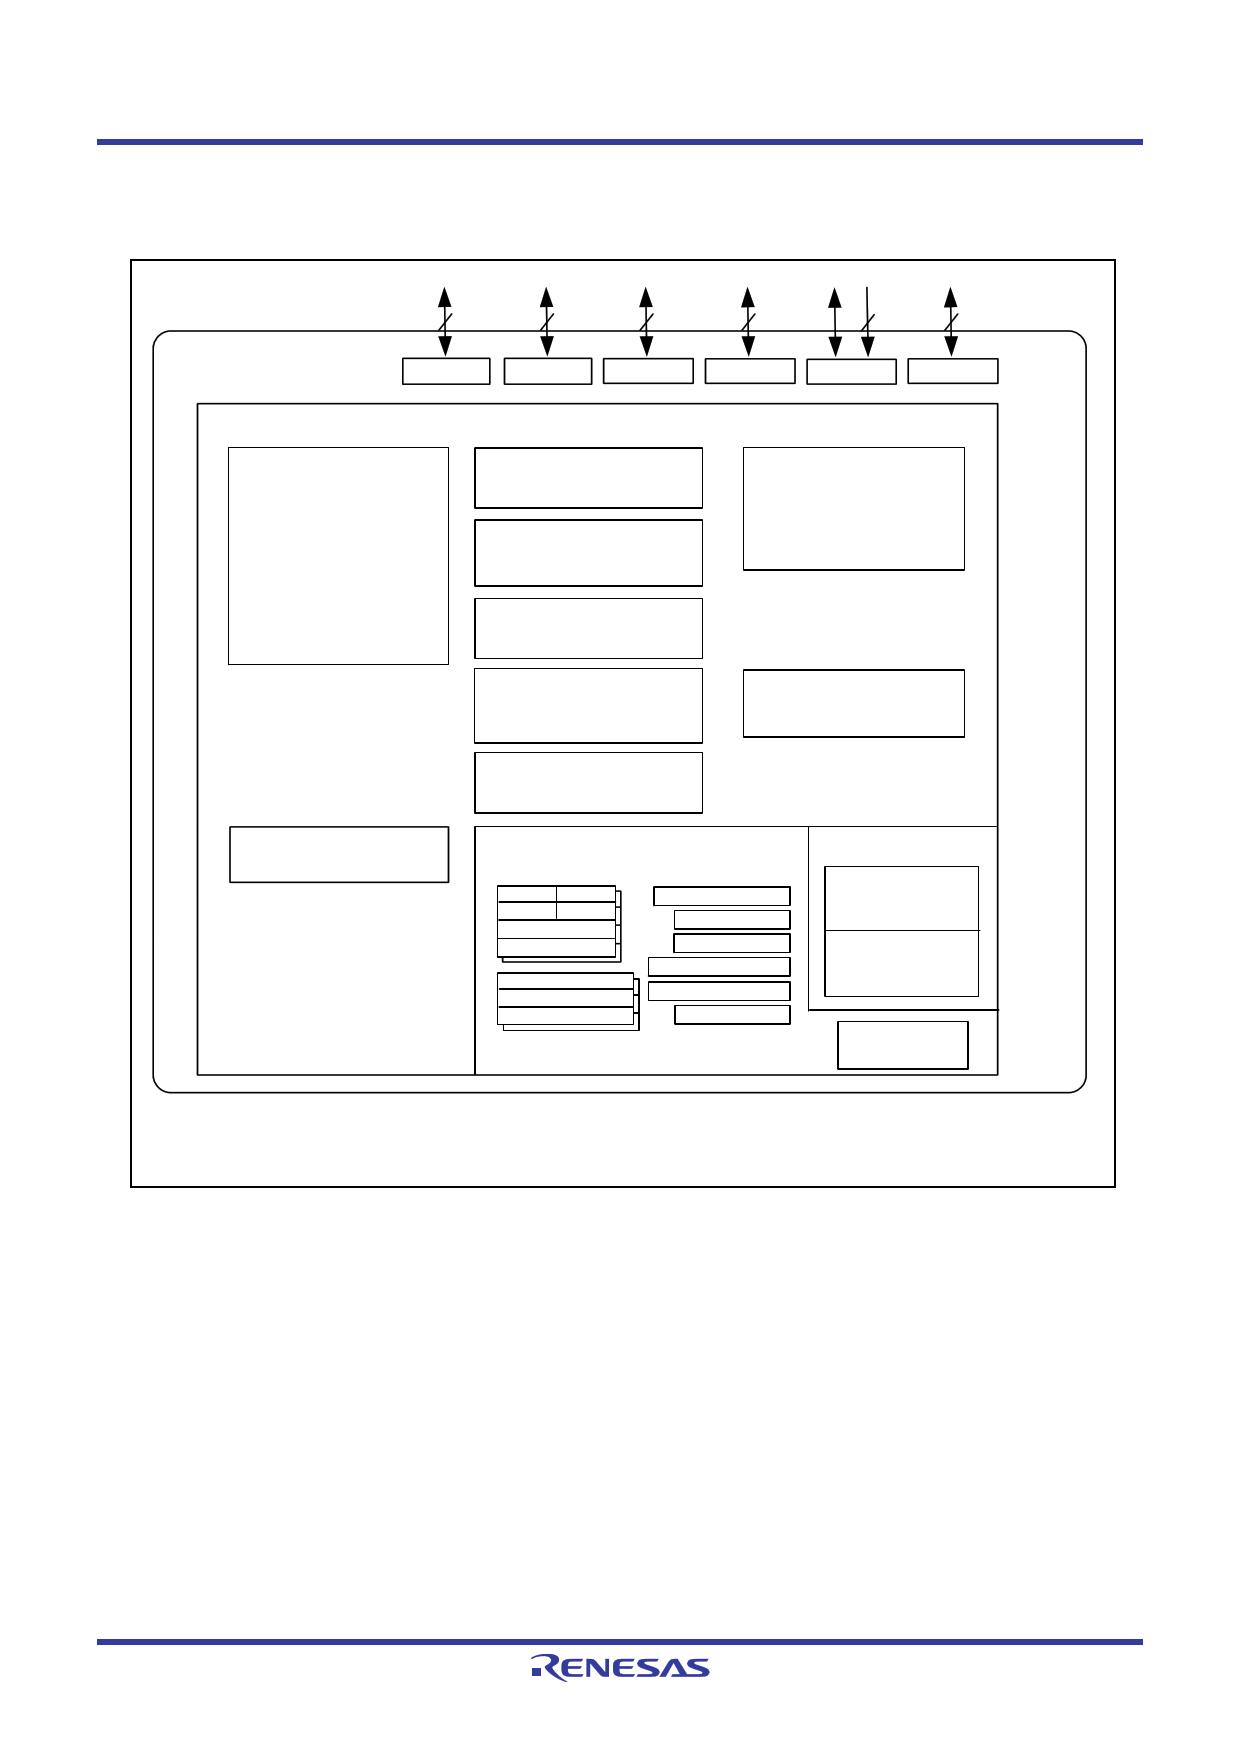 R5F21238JFP pdf, 반도체, 판매, 대치품